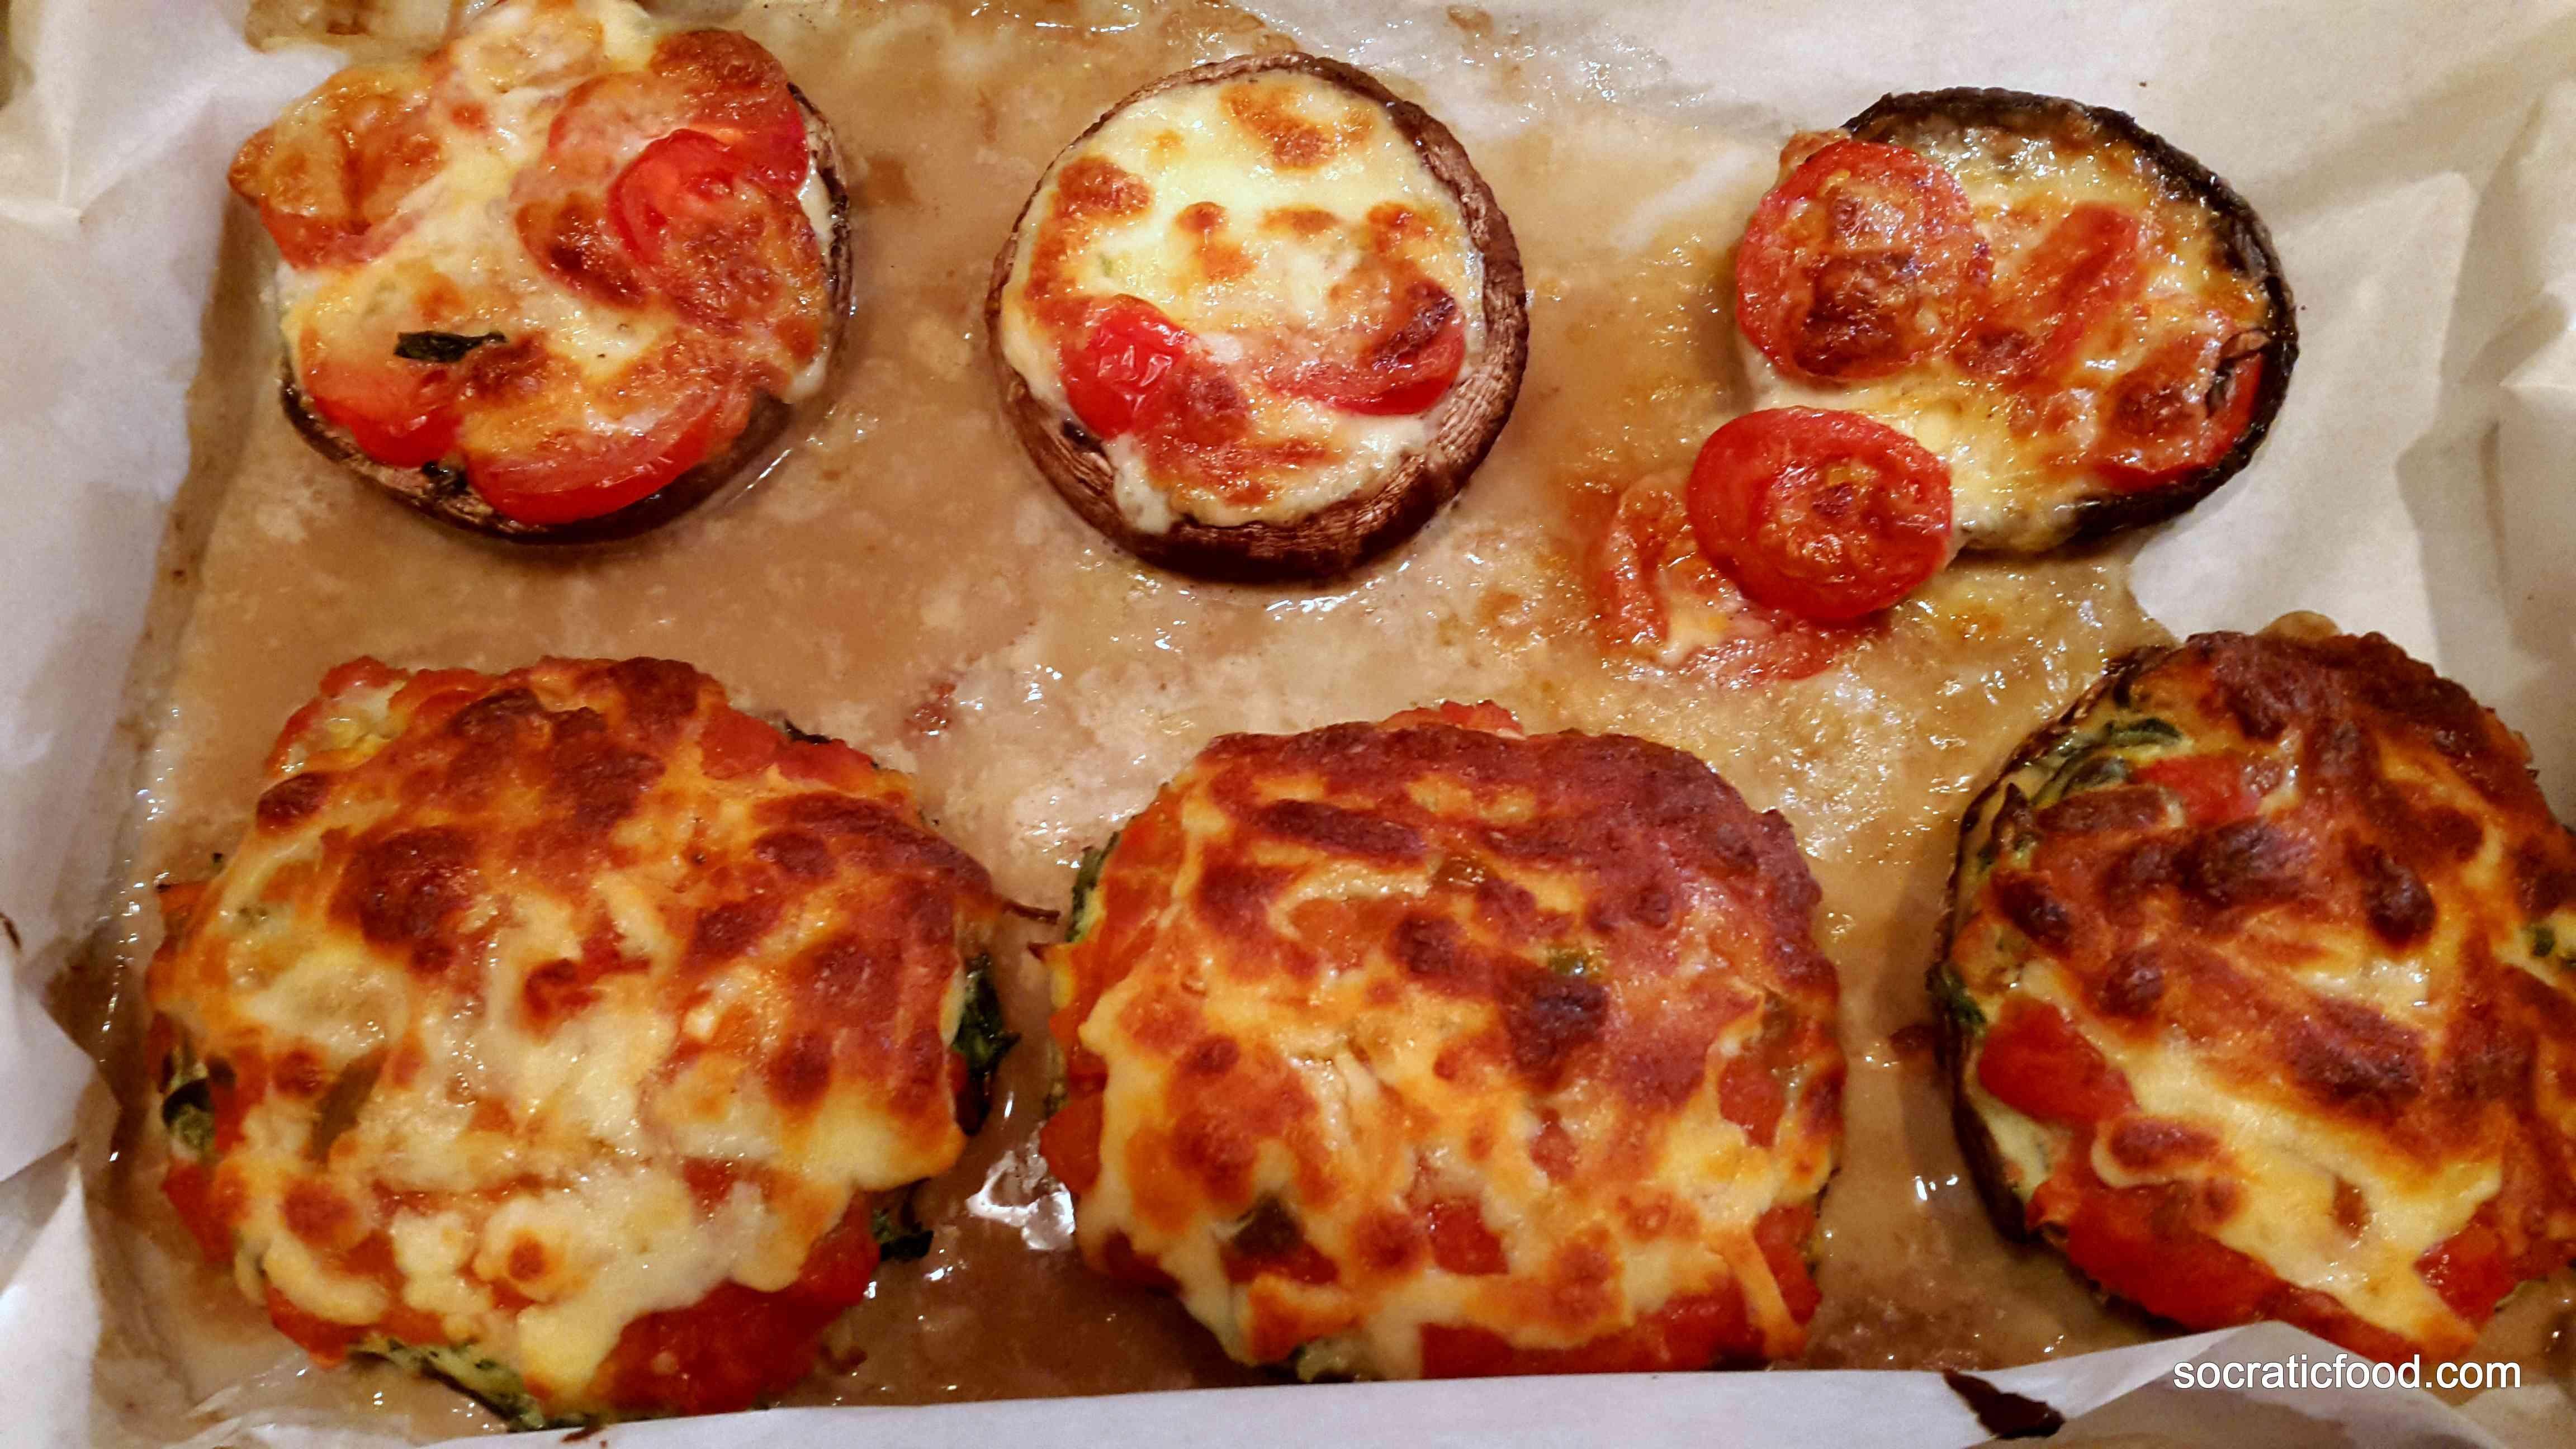 ricotta stuffed portobello mushrooms